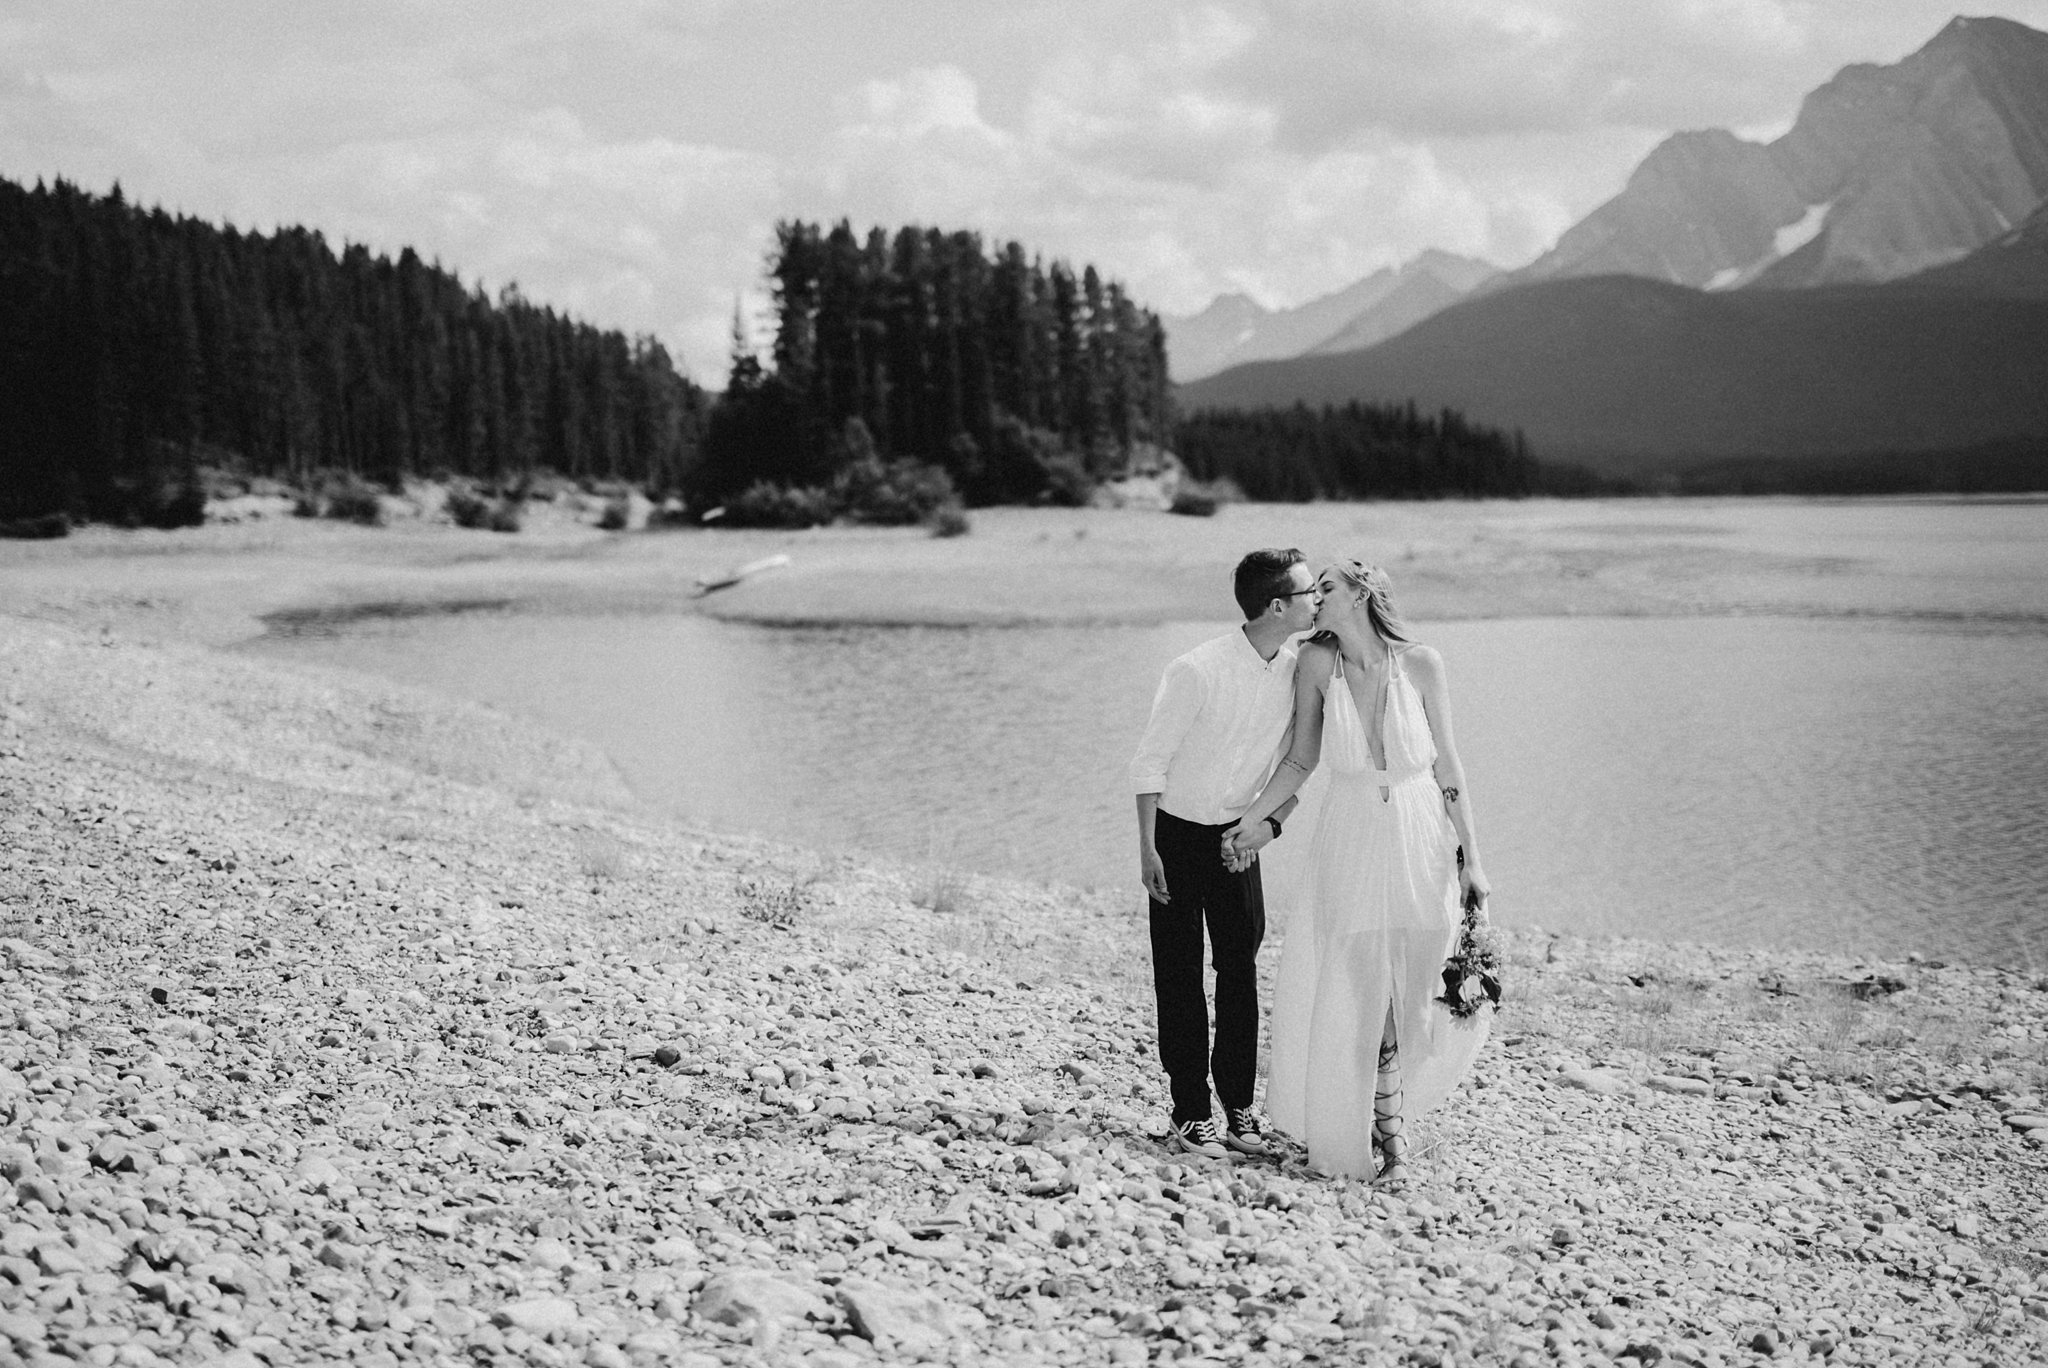 kaihla_tonai_intimate_wedding_elopement_photographer_6409.jpg